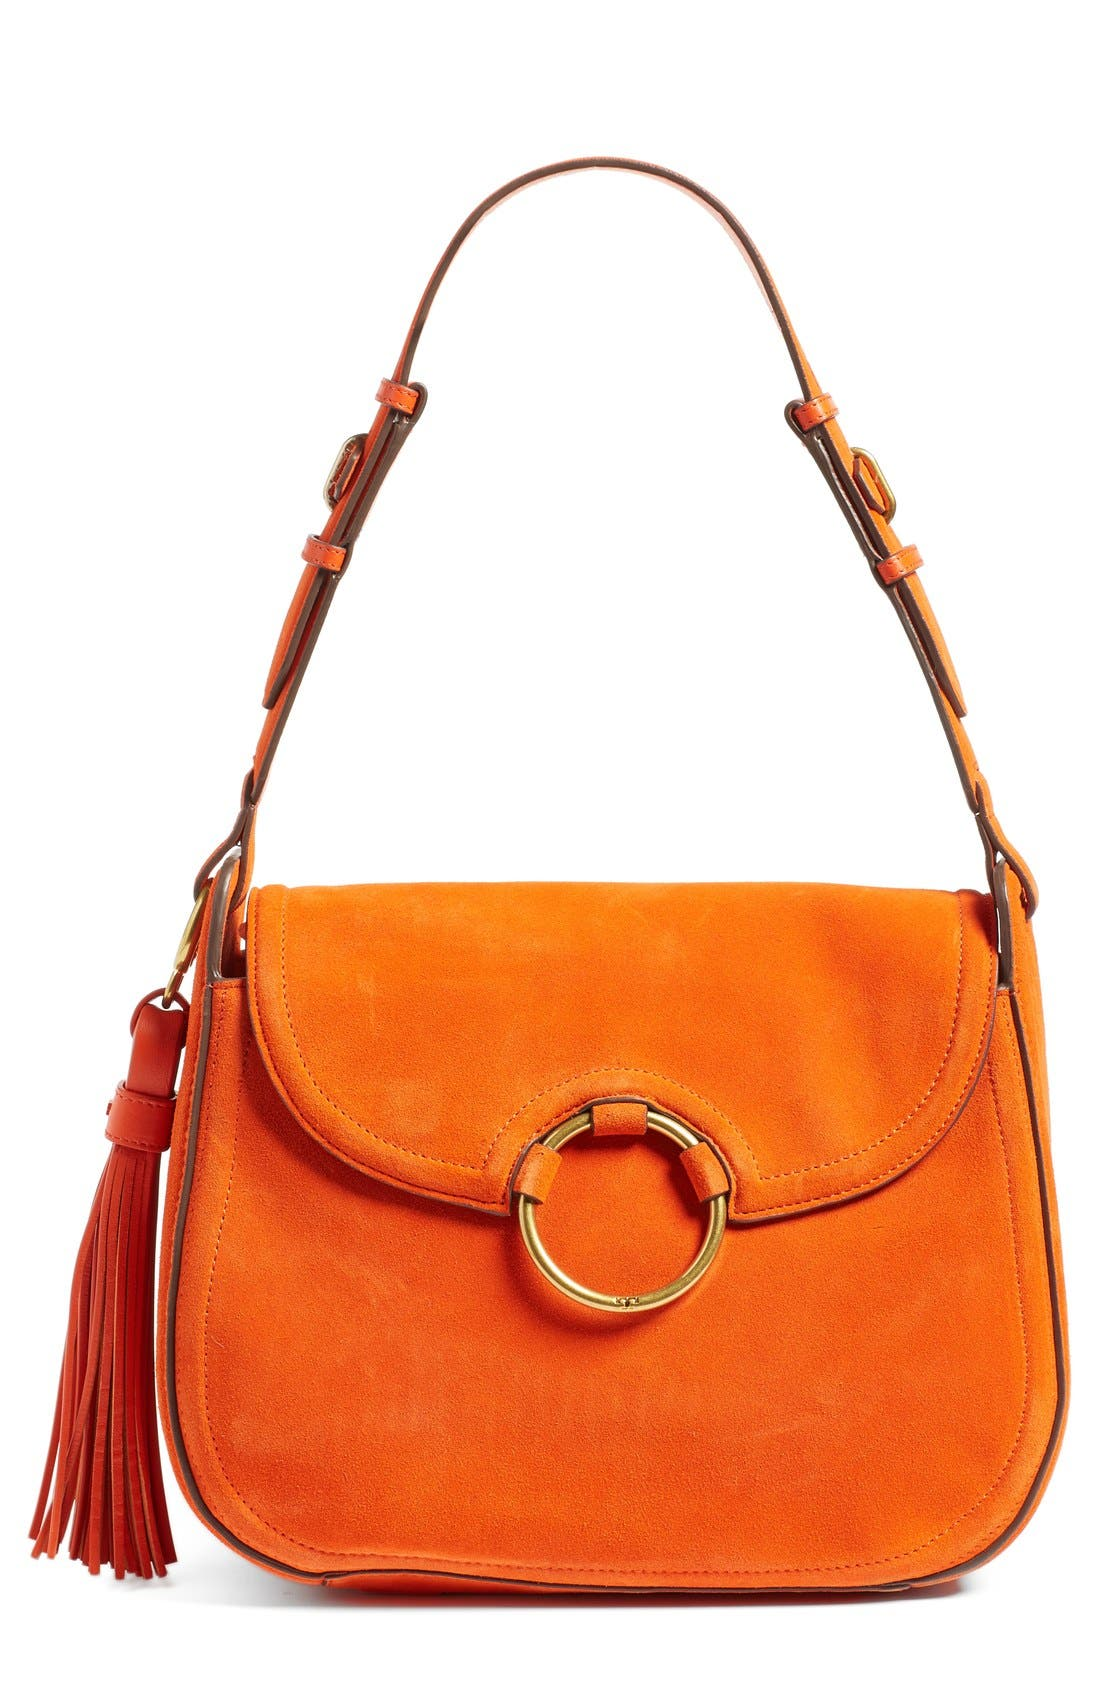 Main Image - Tory Burch Leather Shoulder Bag